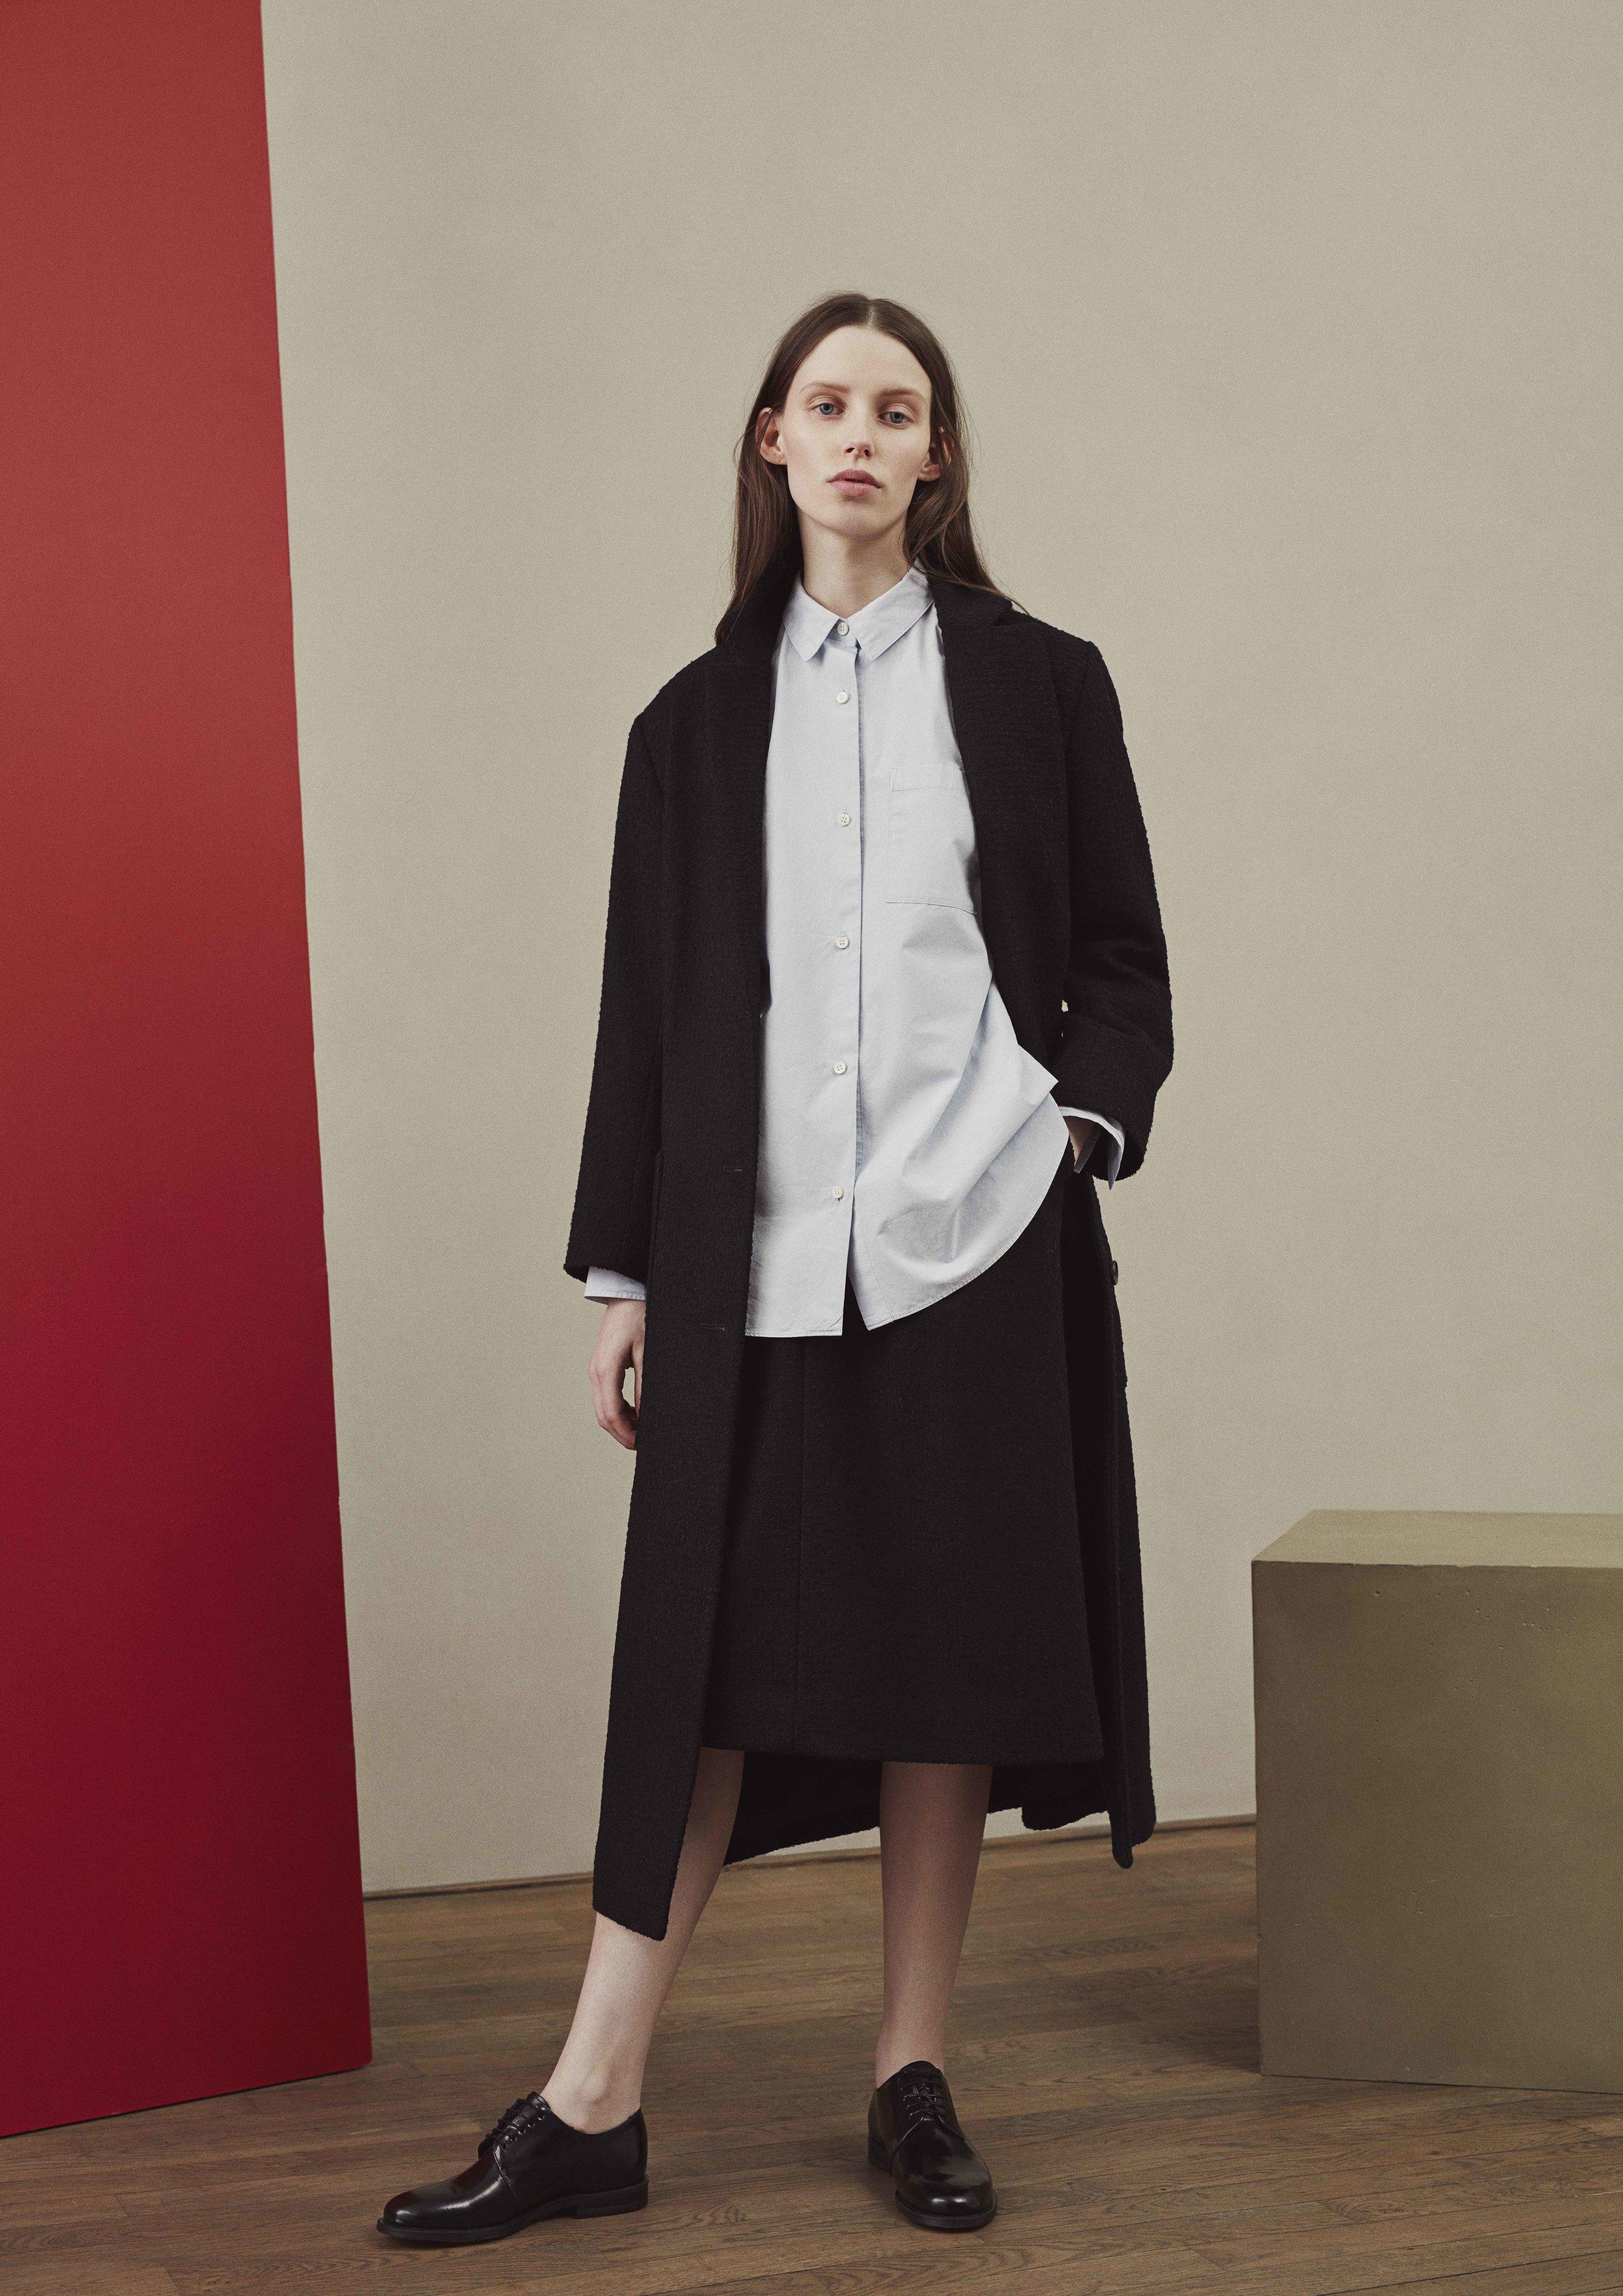 <b>4</b><br>Zelda Cotton Shirt<br>Olivia Textured Wool Skirt<br>Nora Textured Wool Coat